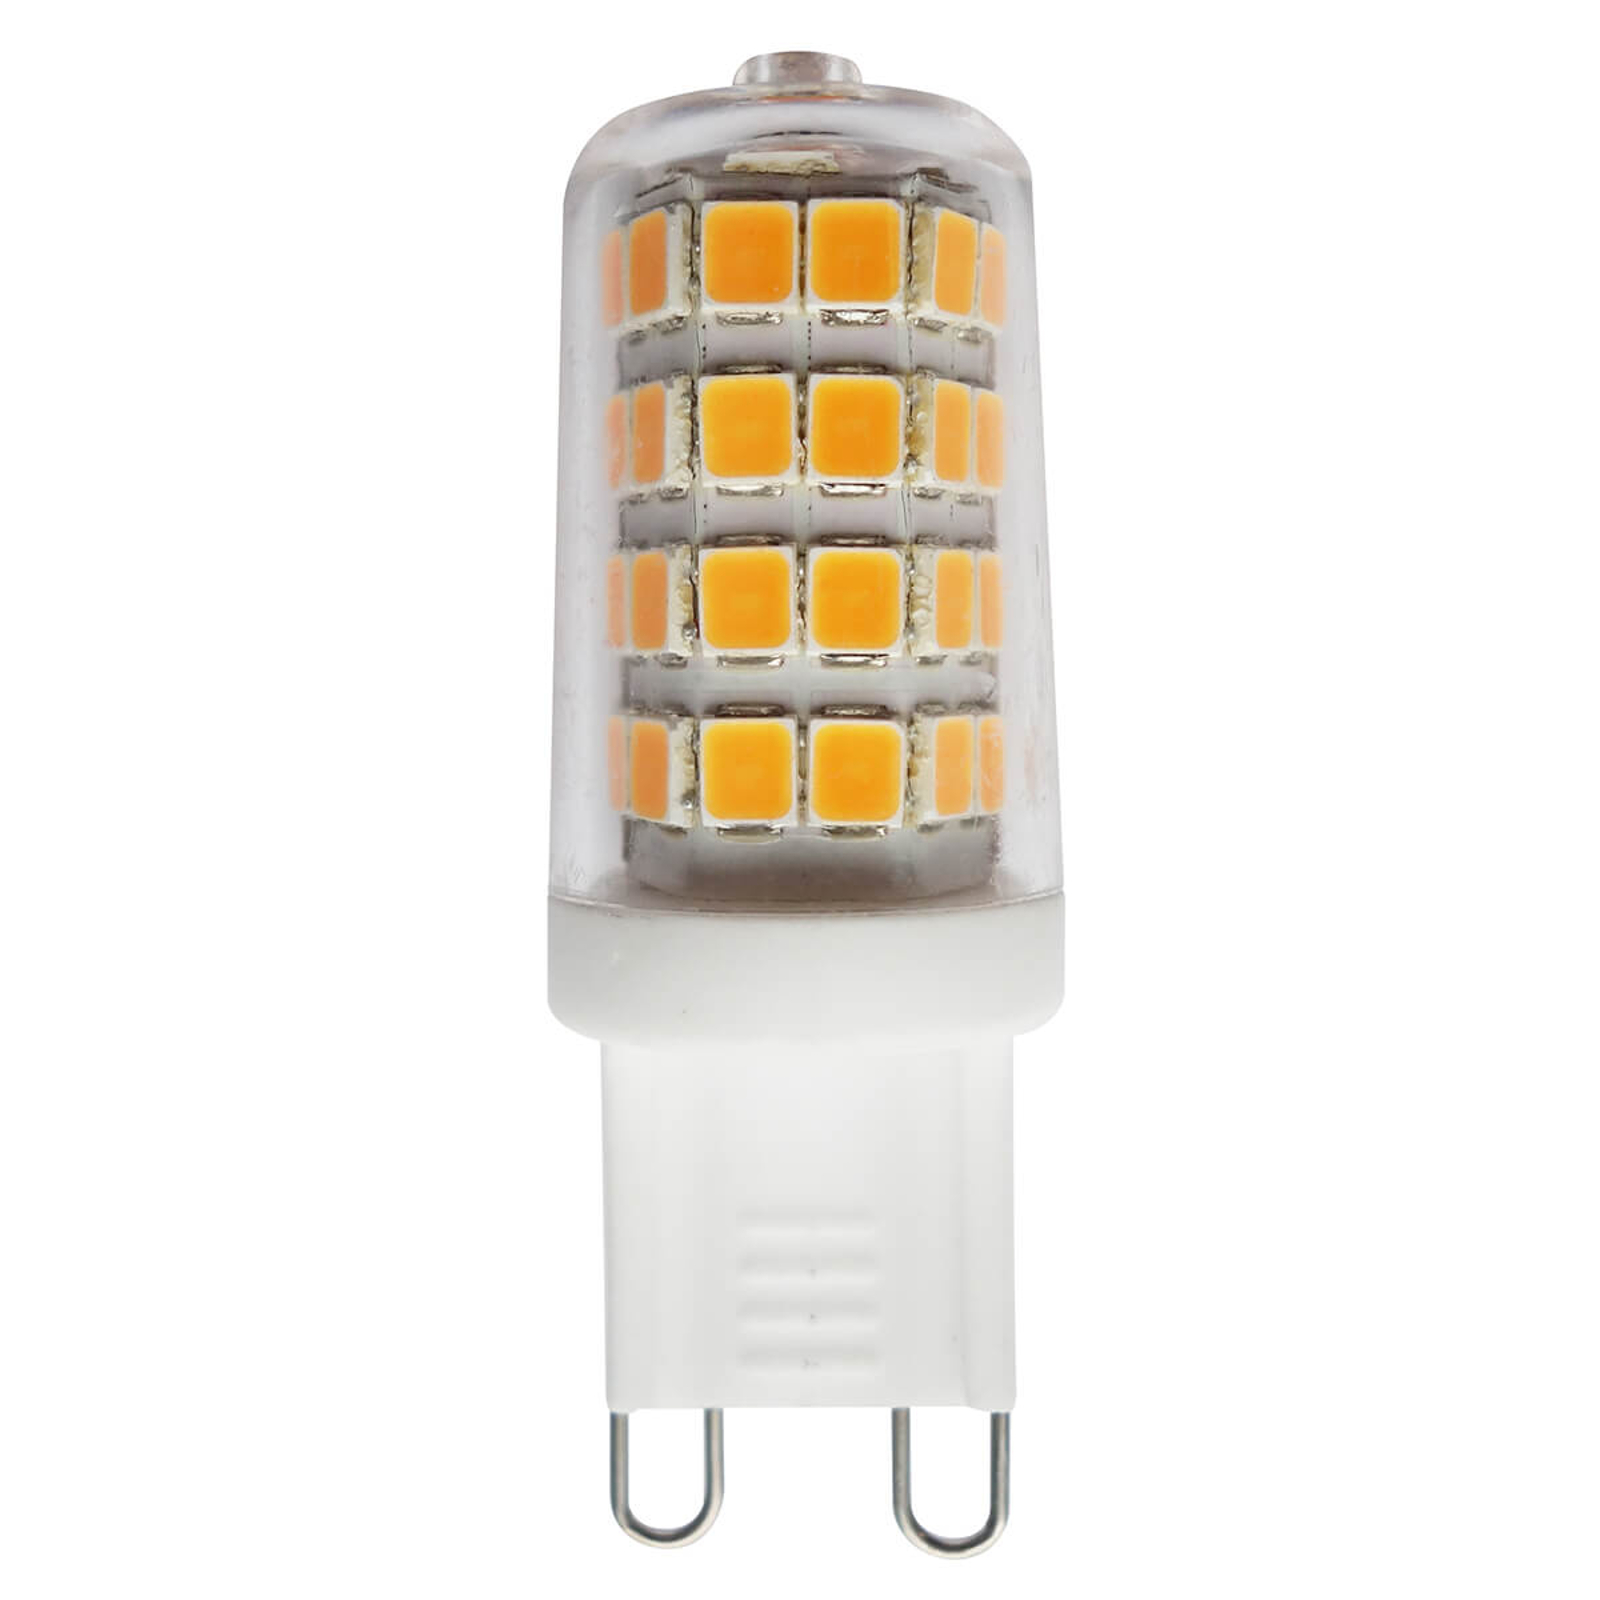 G9 3 W 827 LED bi-pin bulb, clear_6520263_1